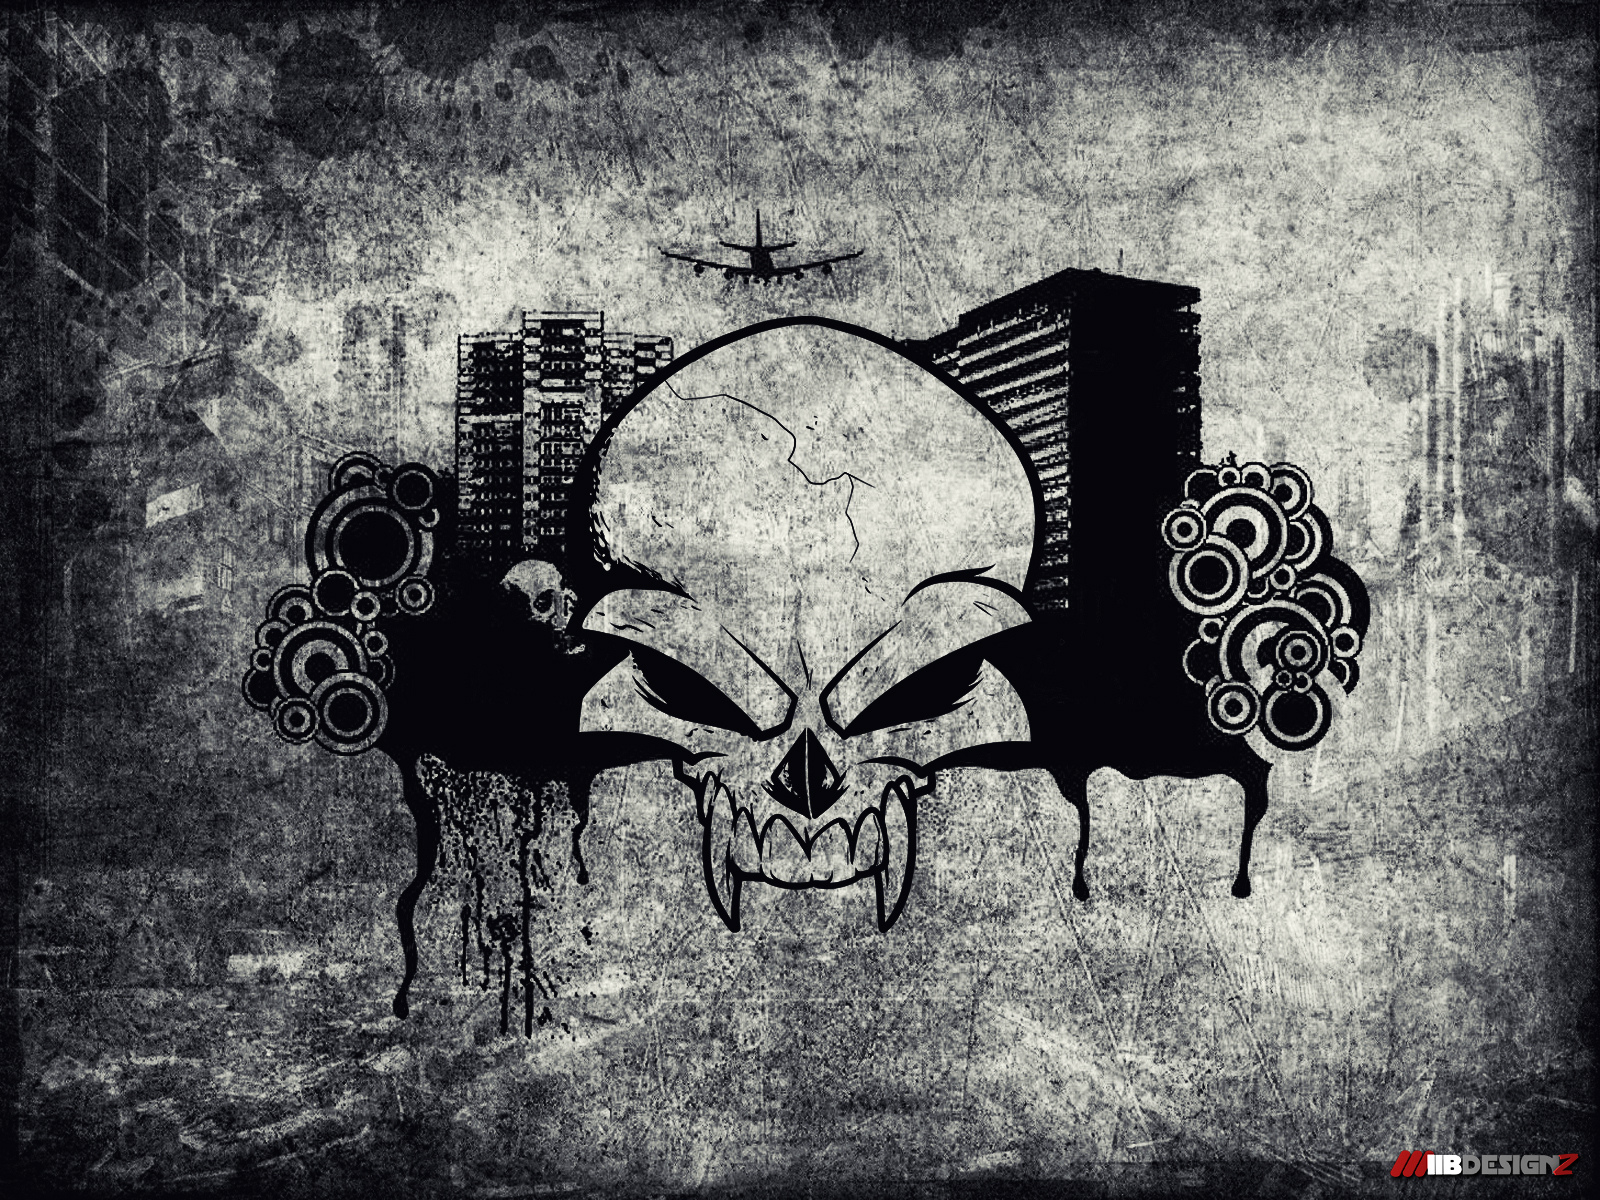 72+] Evil Skull Wallpapers on WallpaperSafari